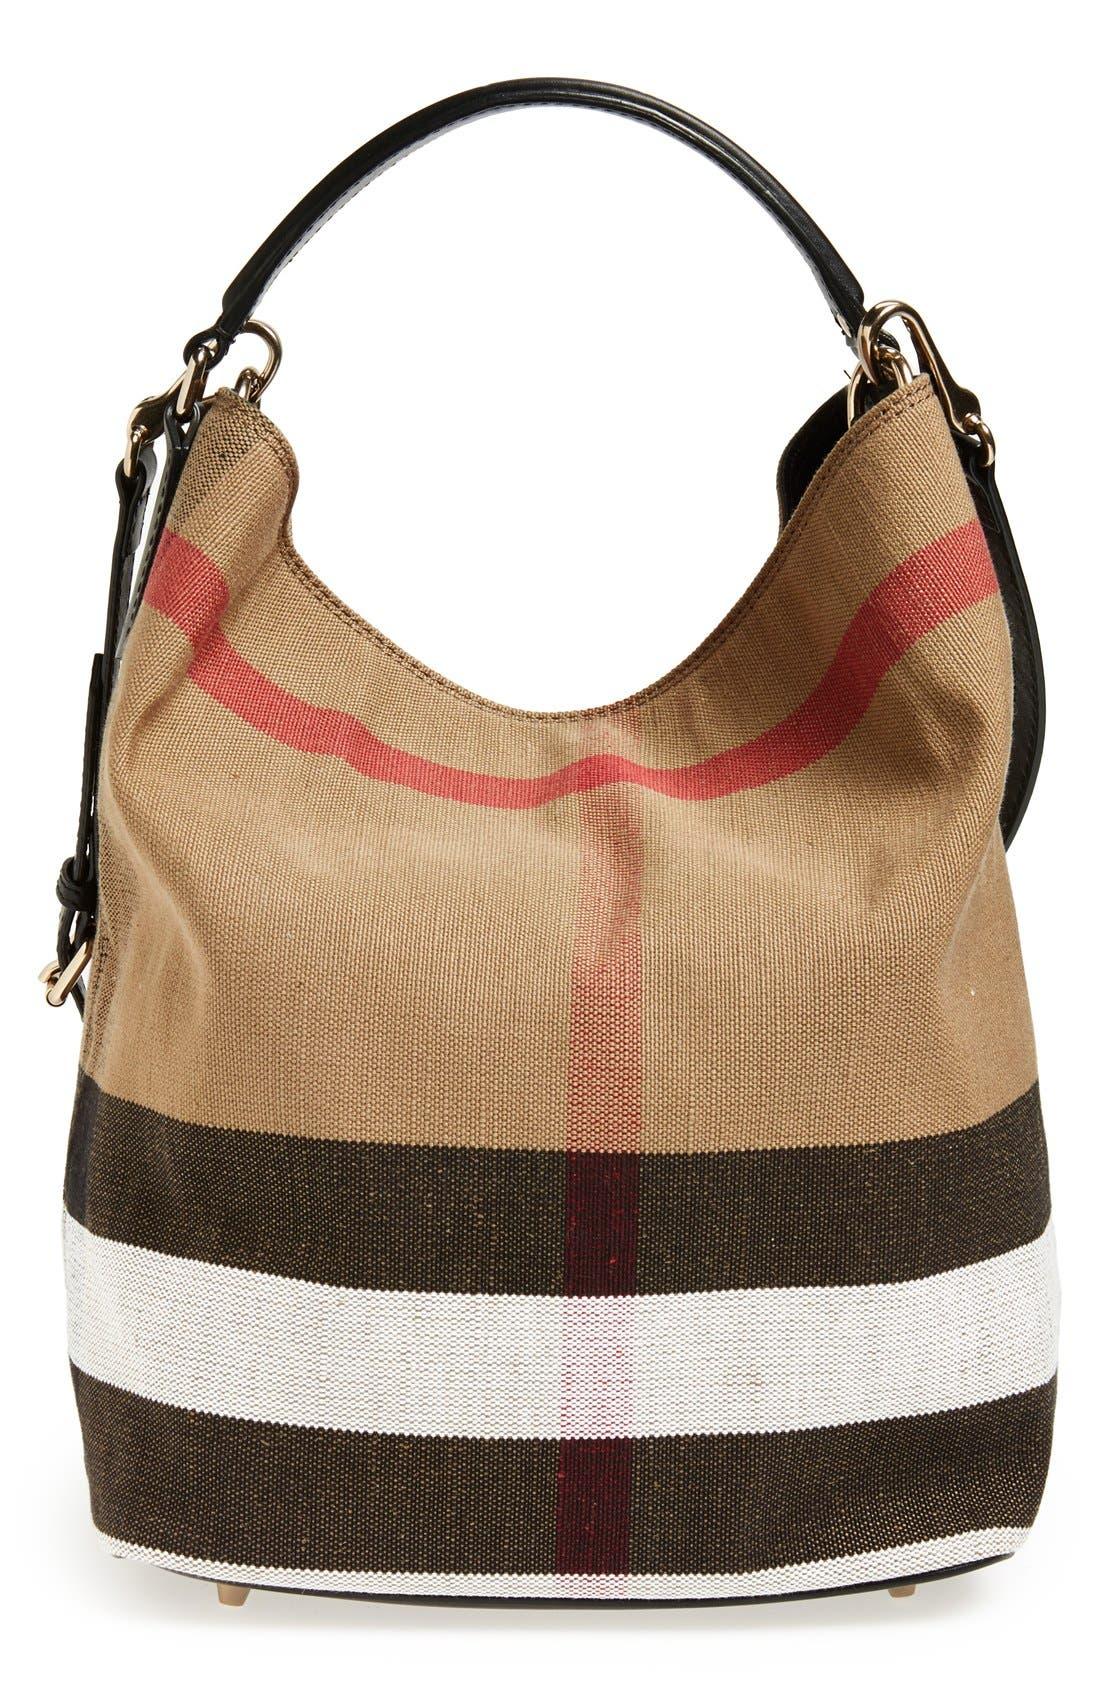 Medium Susanna Check Print Bucket Bag,                         Main,                         color, 001